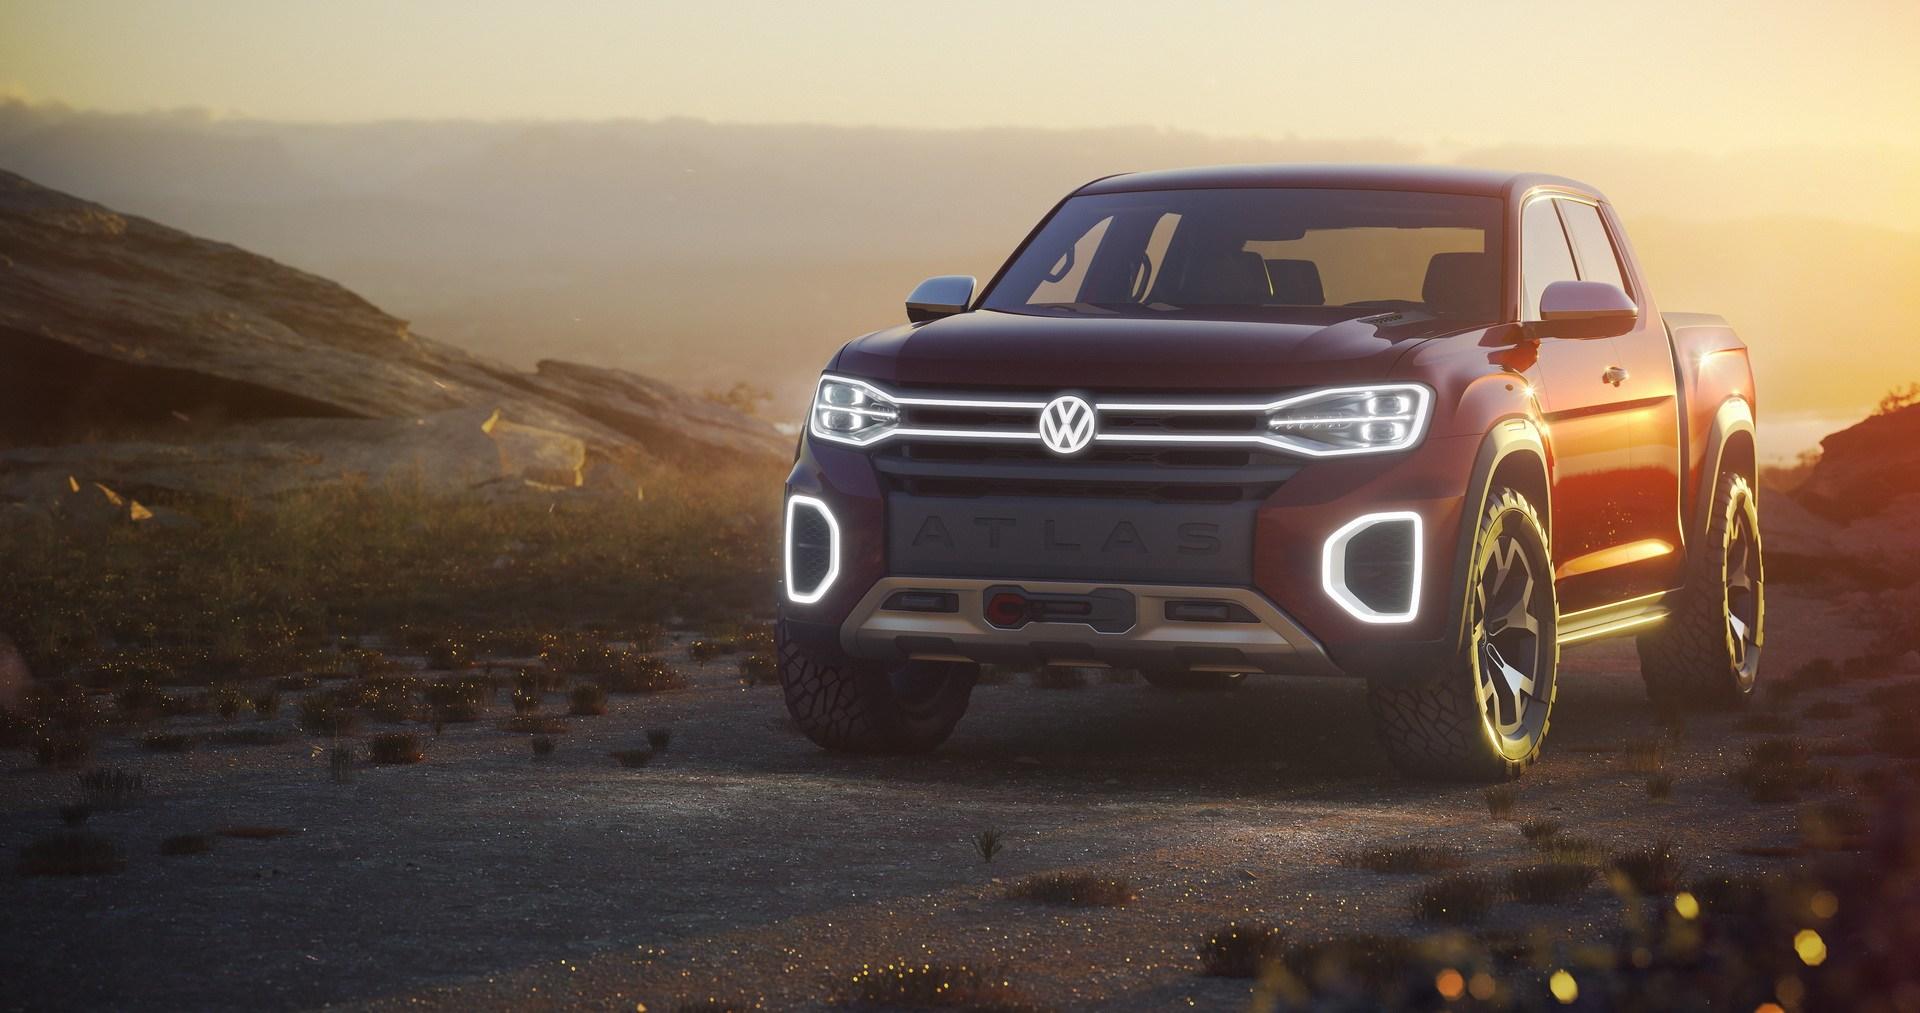 Volkswagen Atlas Tanoak 2018. Koncepcyjny pickup na bazie SUVa